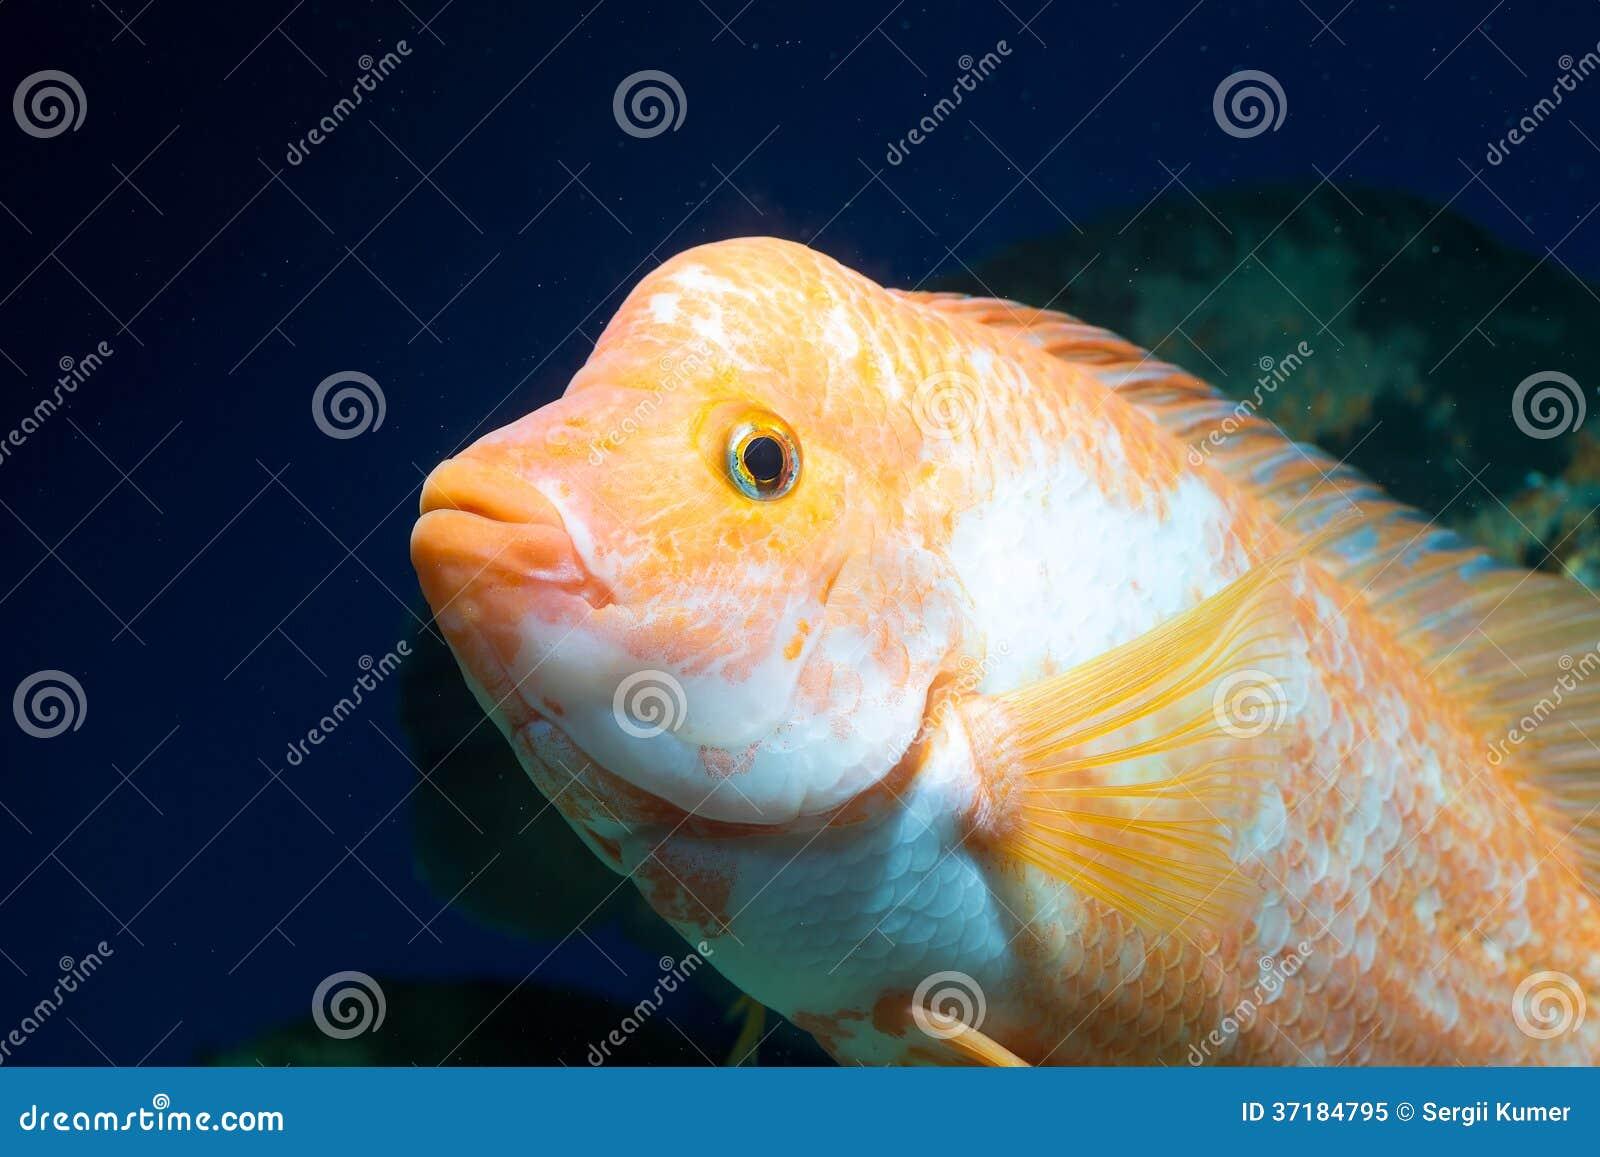 Grote Cichlids In Aquarium Royalty vrije Stock Foto   Afbeelding  37184795